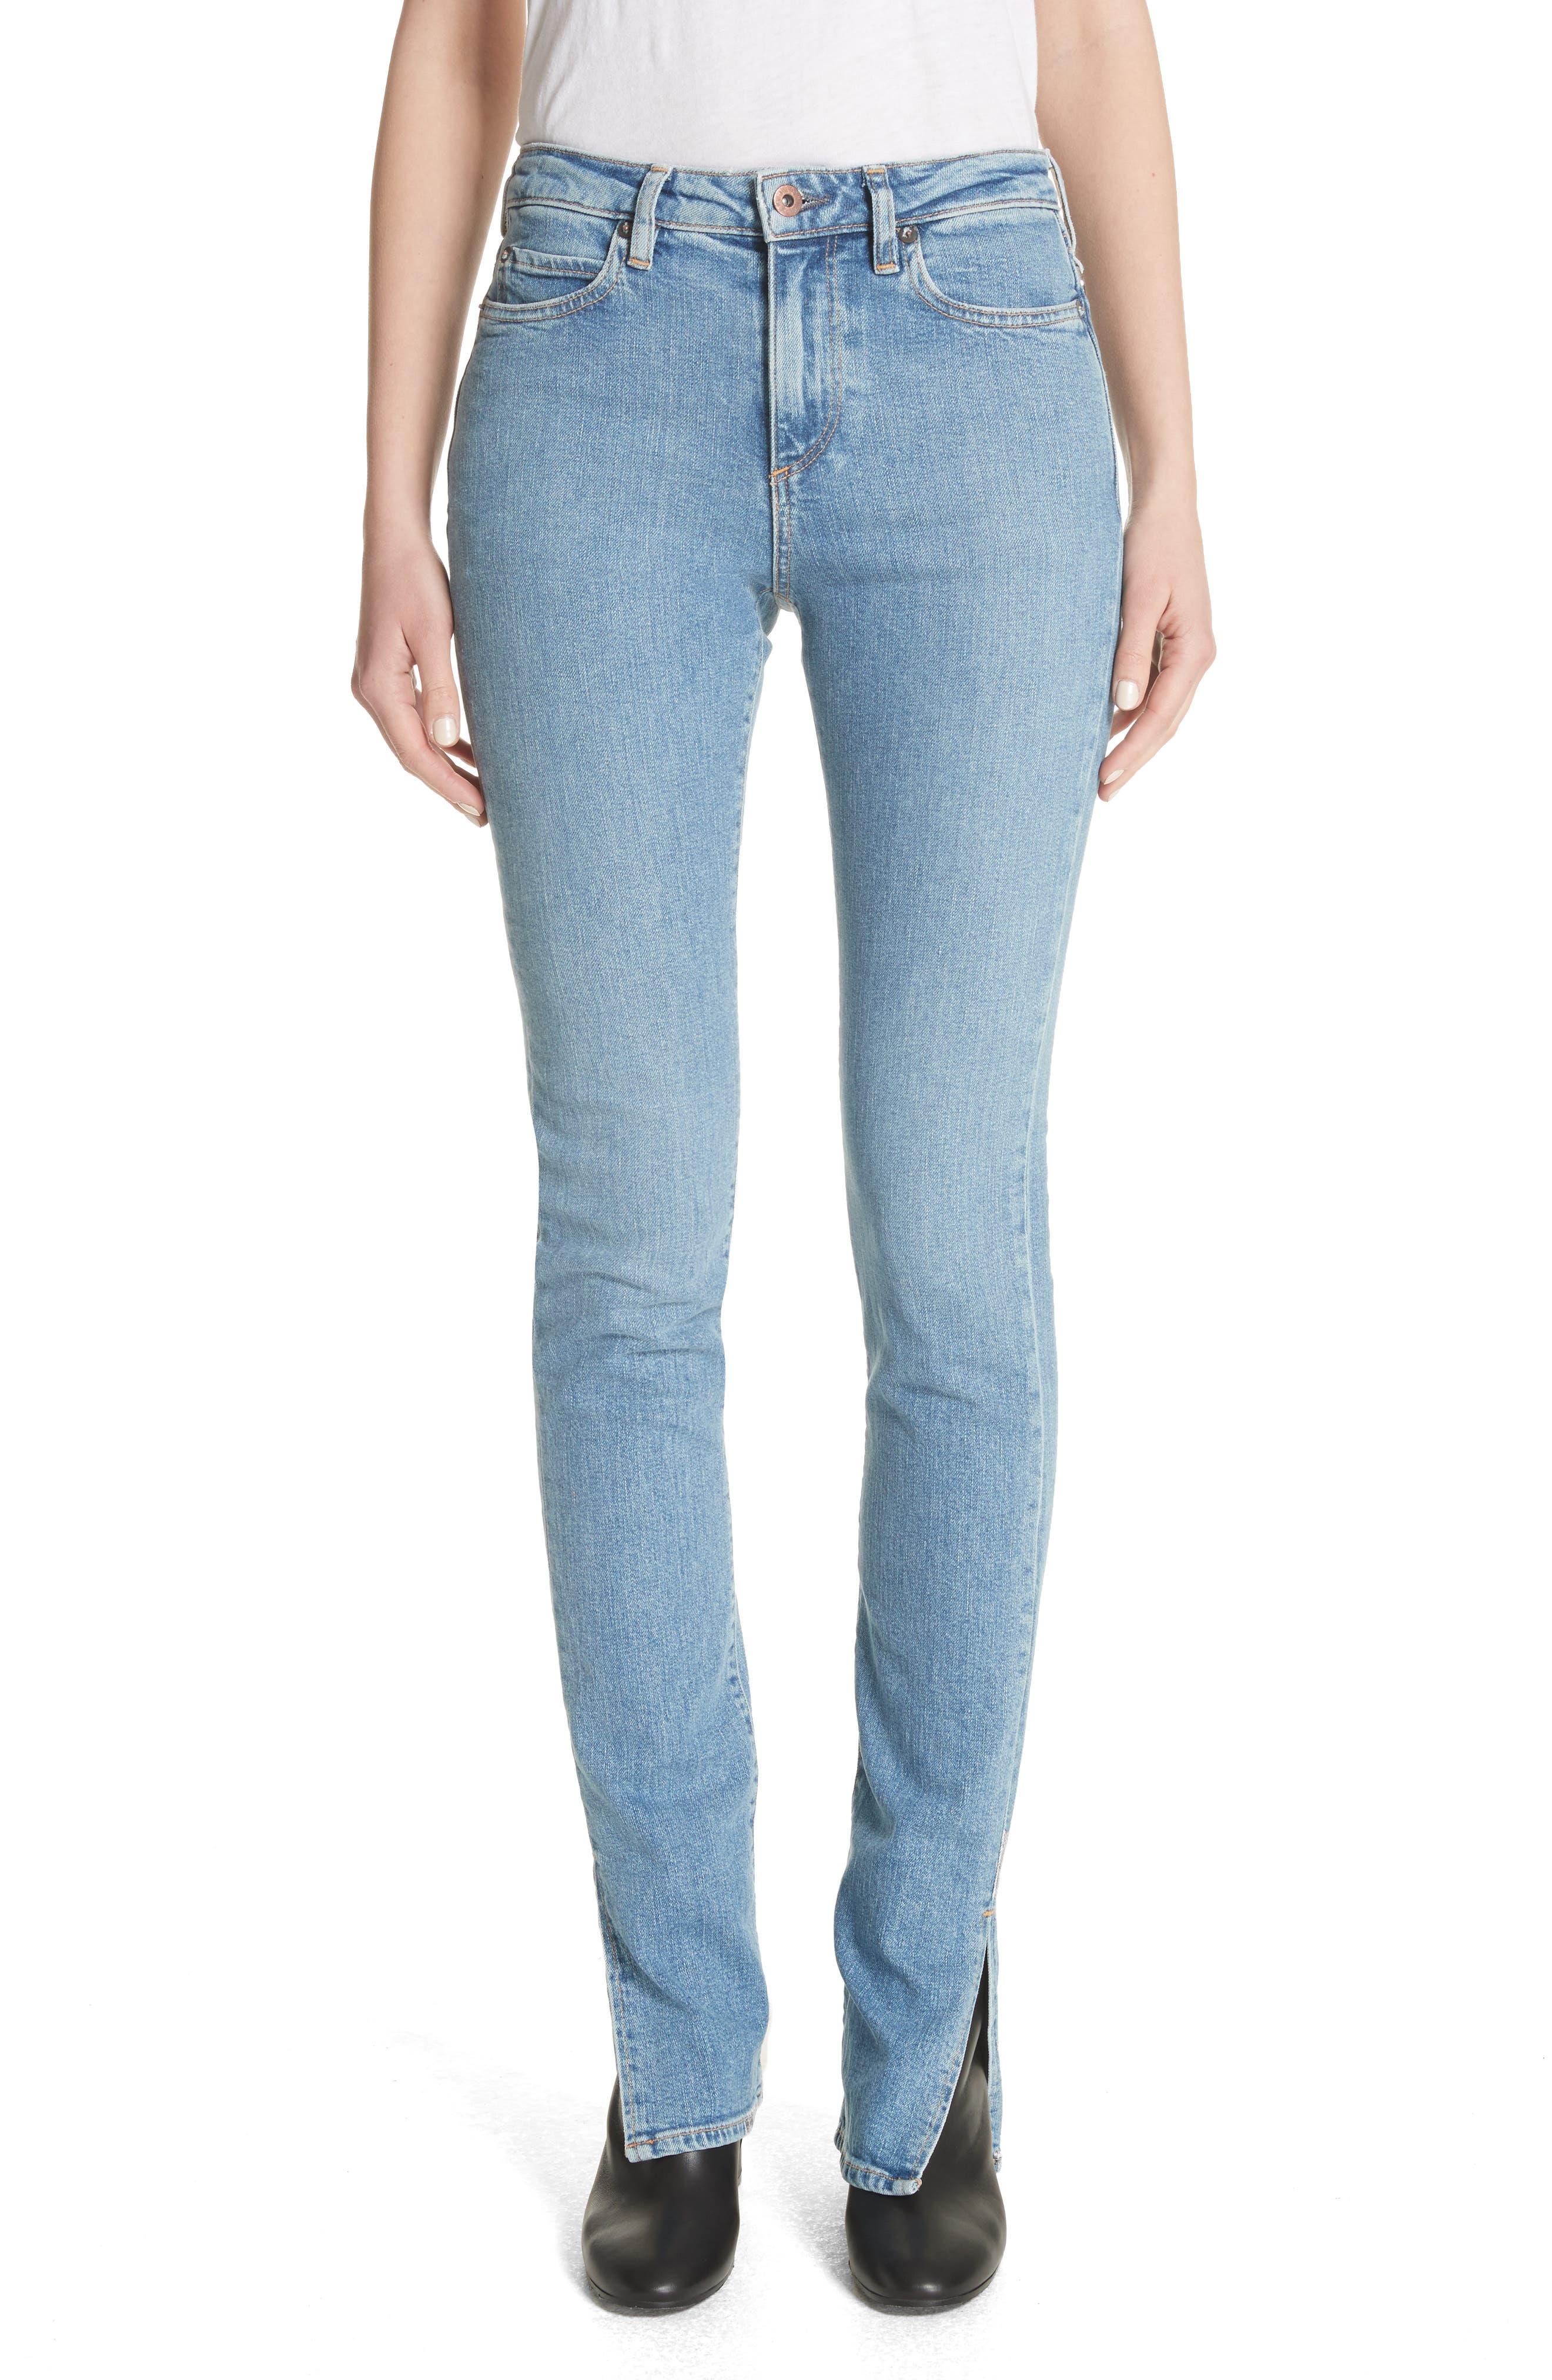 Lowry Split Hem Jeans,                             Main thumbnail 1, color,                             Mid Indigo Wash